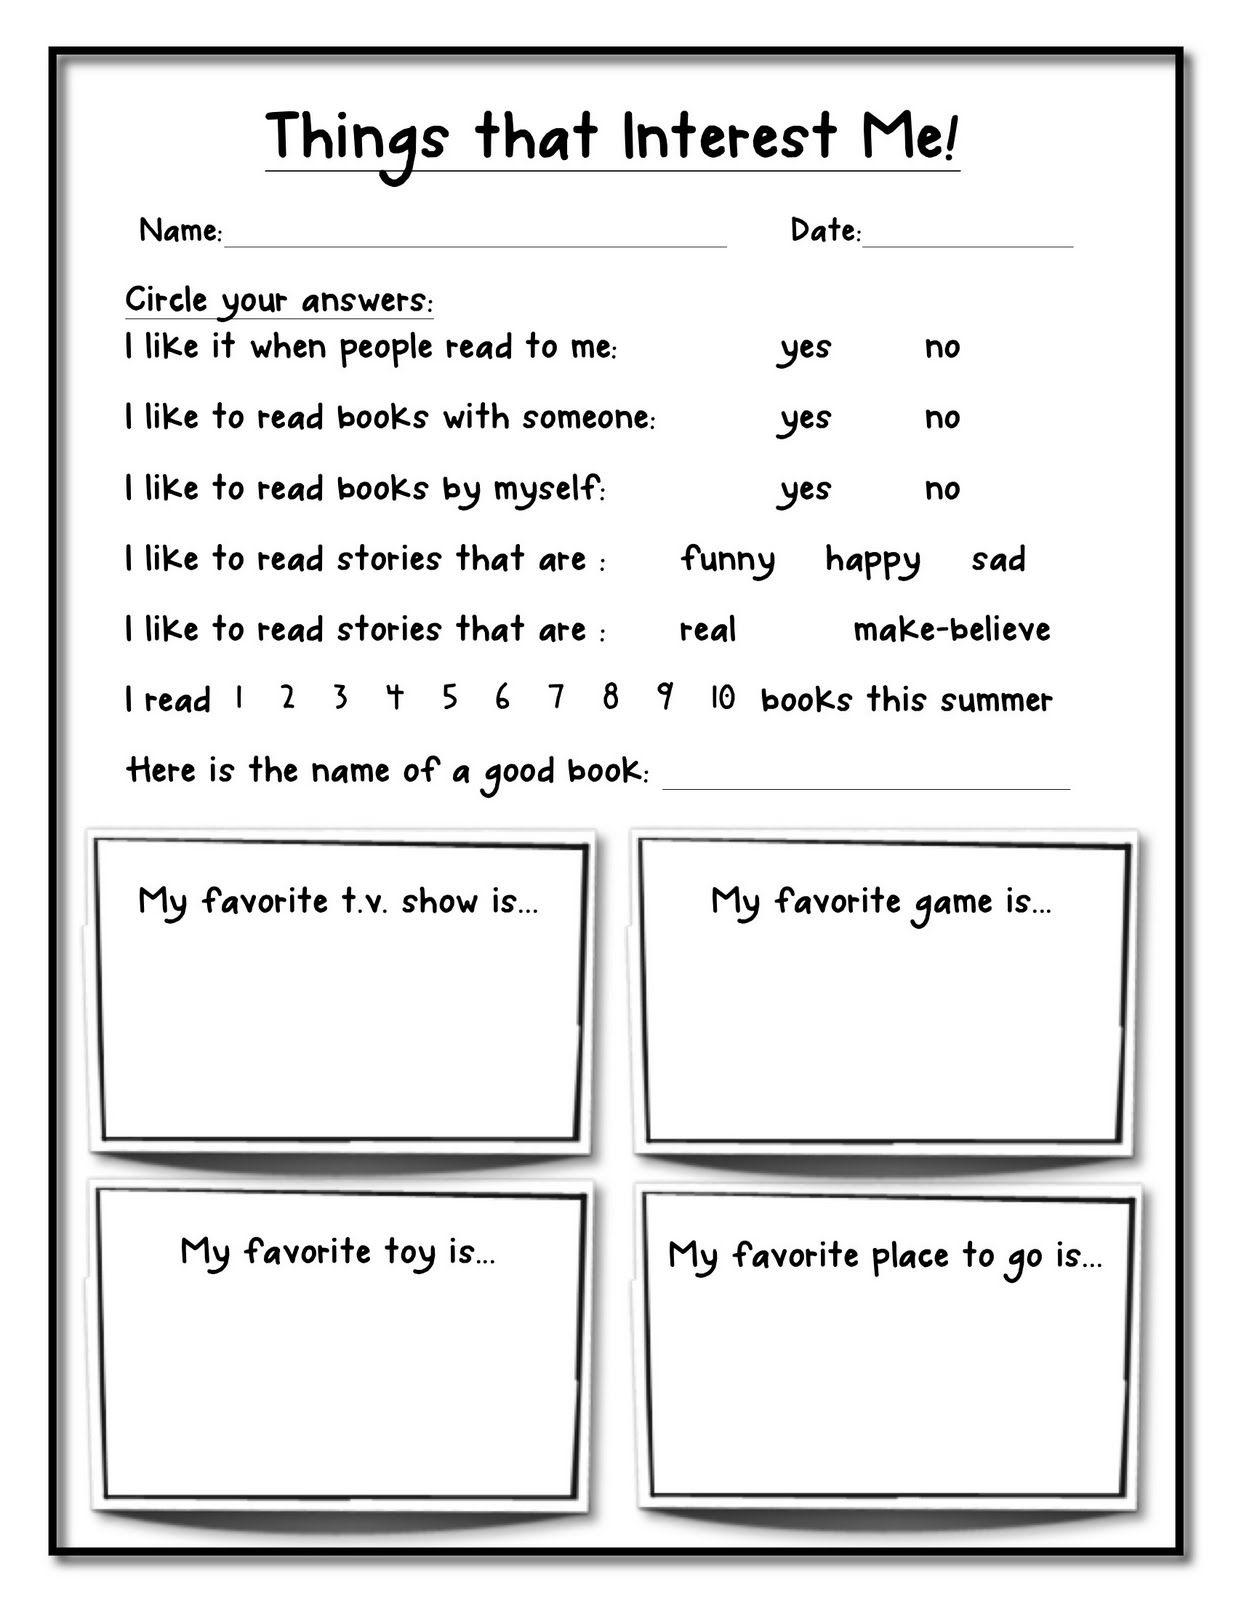 the teacher organizer things that interest me kid survey this